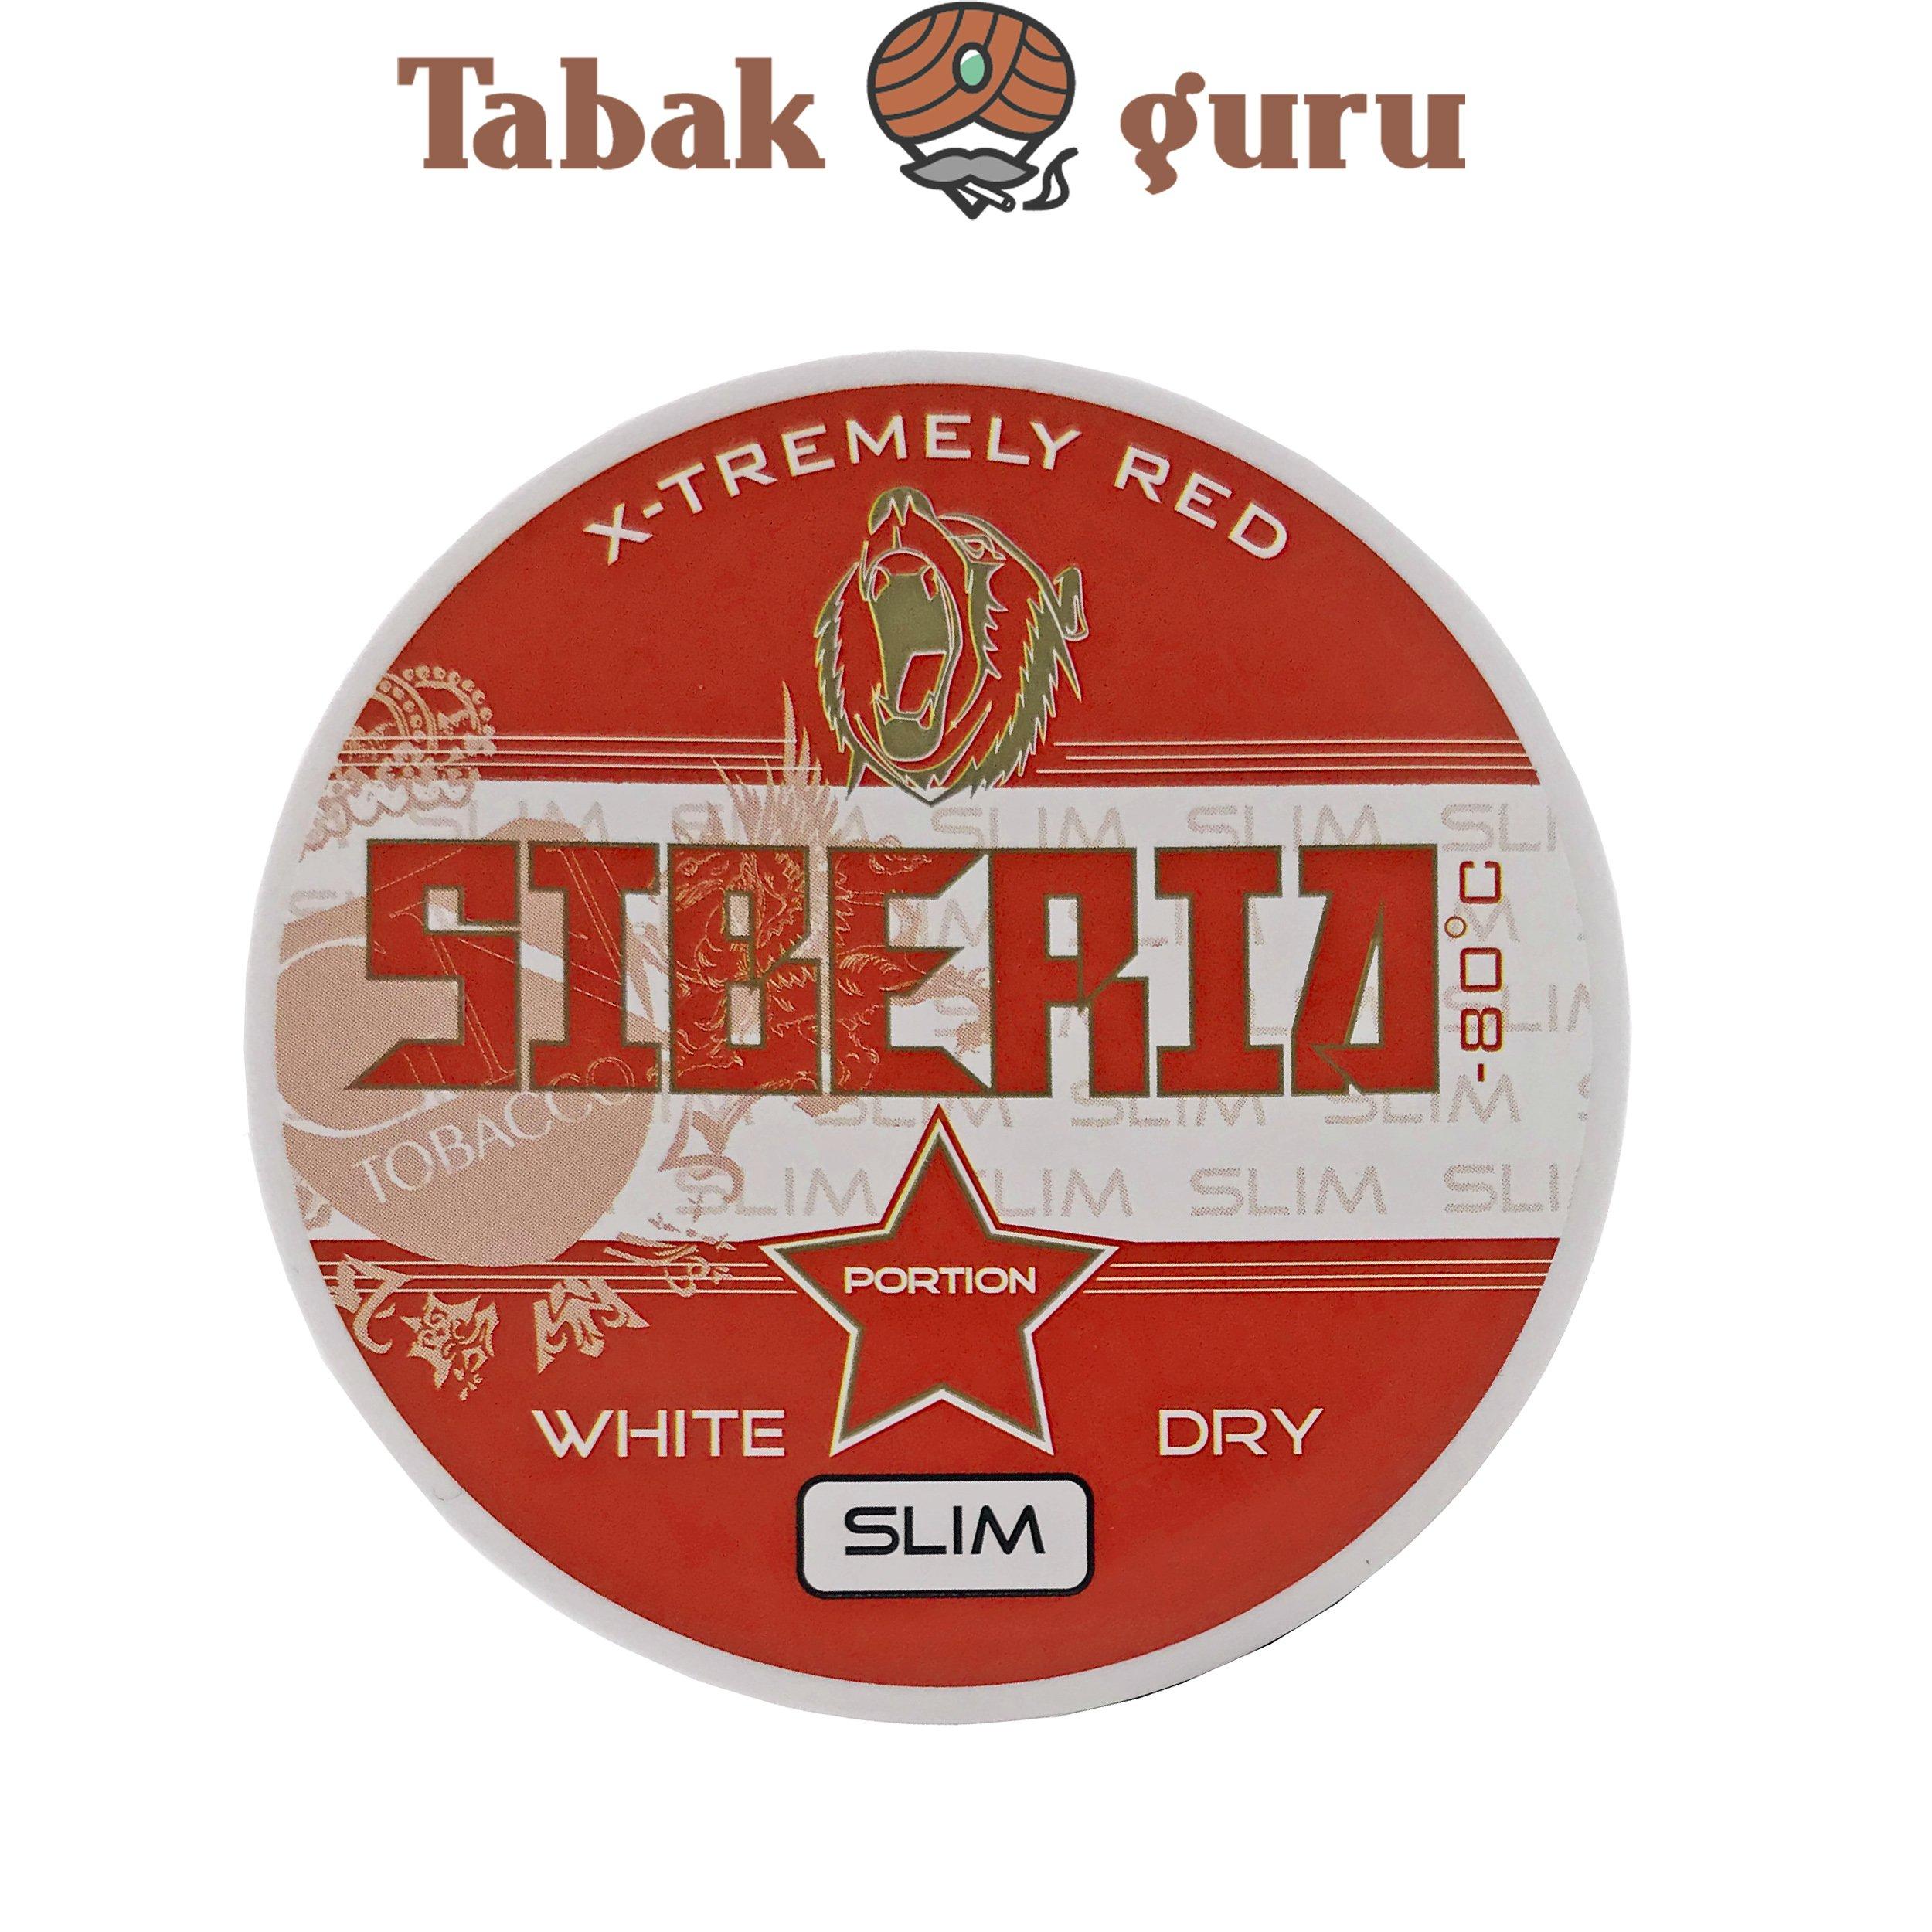 Siberia 80° Extremely Red White Dry Slim Kautabak Dose